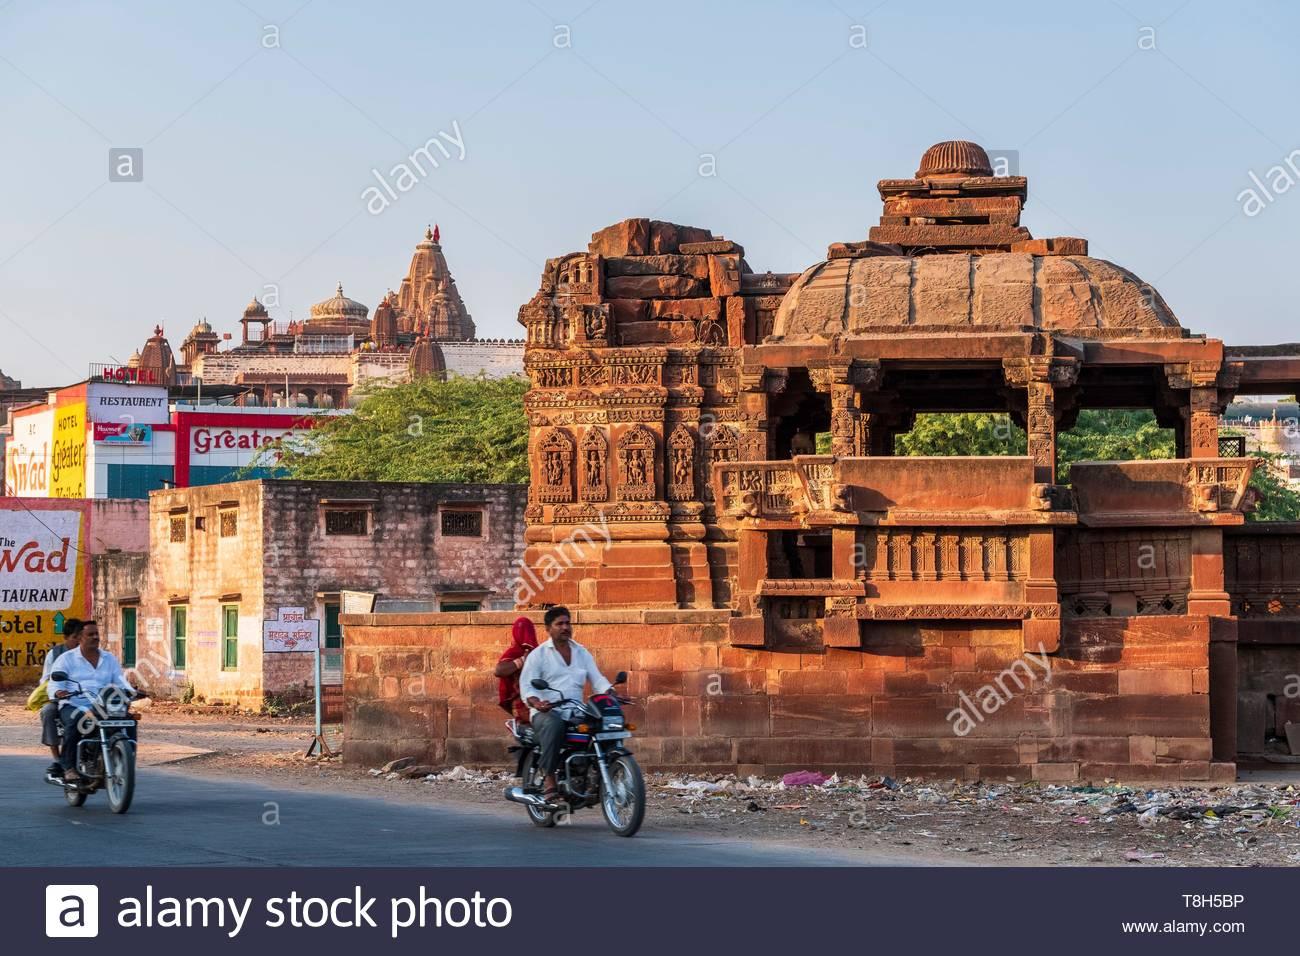 India Rajasthan Osiyan or Osian gateway to the Thar desert 1300x956